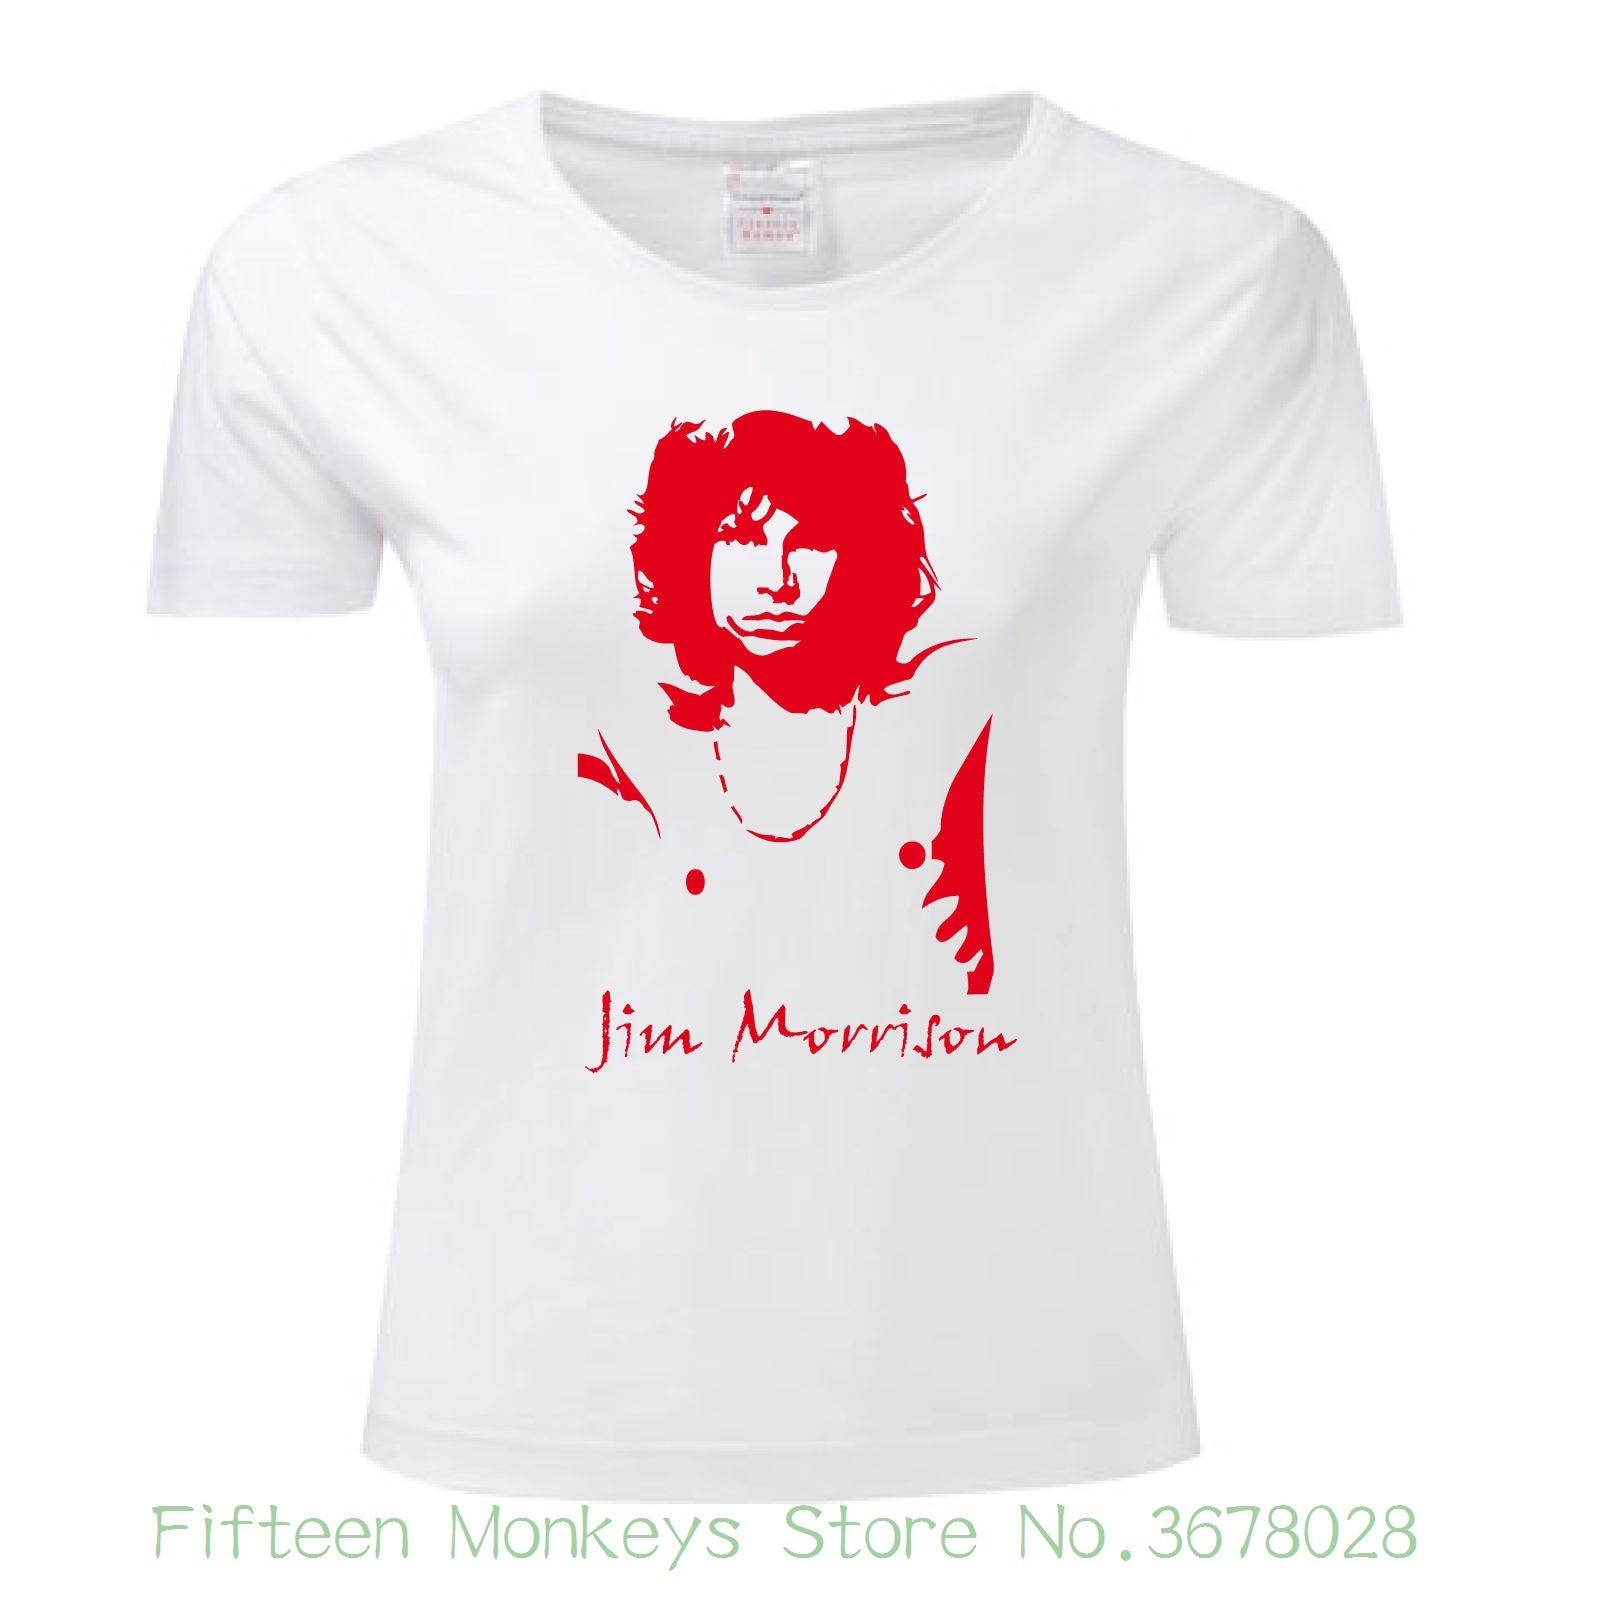 T-SHIRT MAGLIETTA UOMO DONNA JIM MORRISON THE DOORS ROCK MUSIC MUSICA COLORS